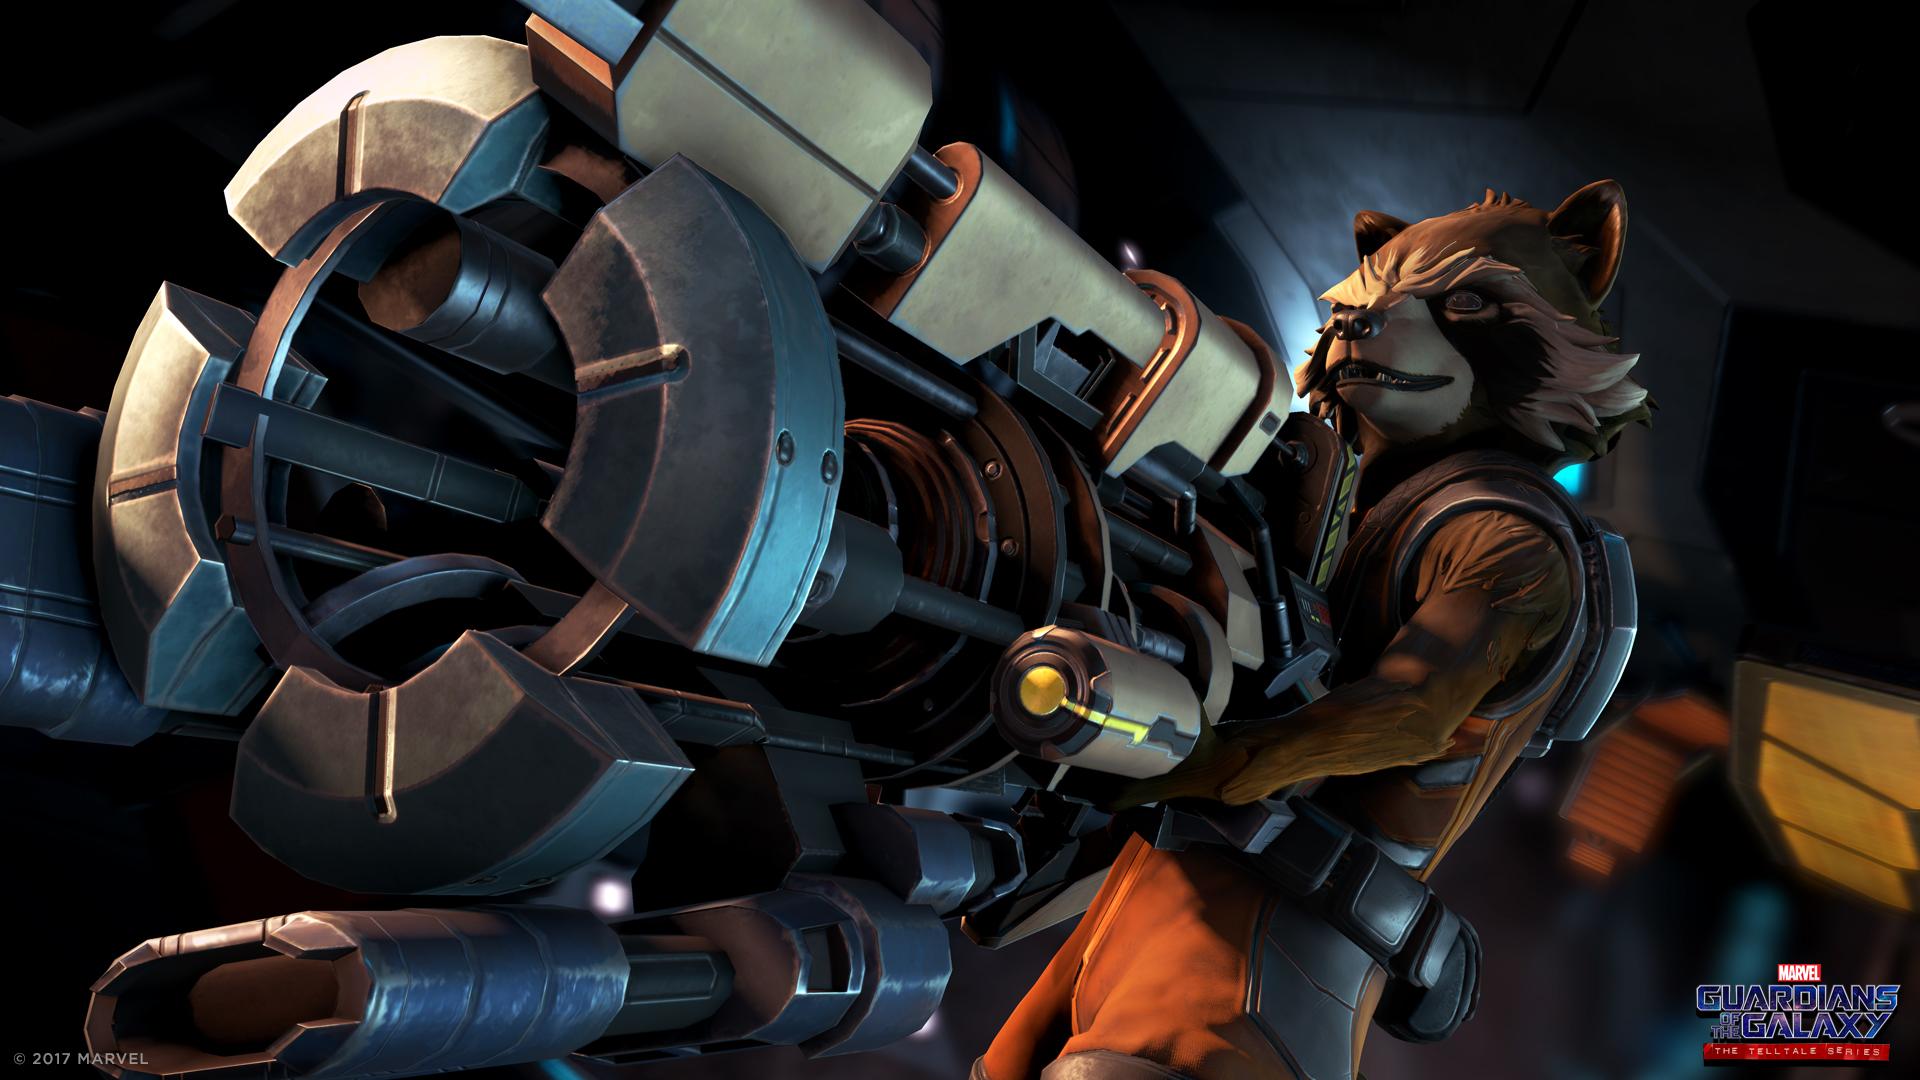 6souls games series telltale galaxy guardians